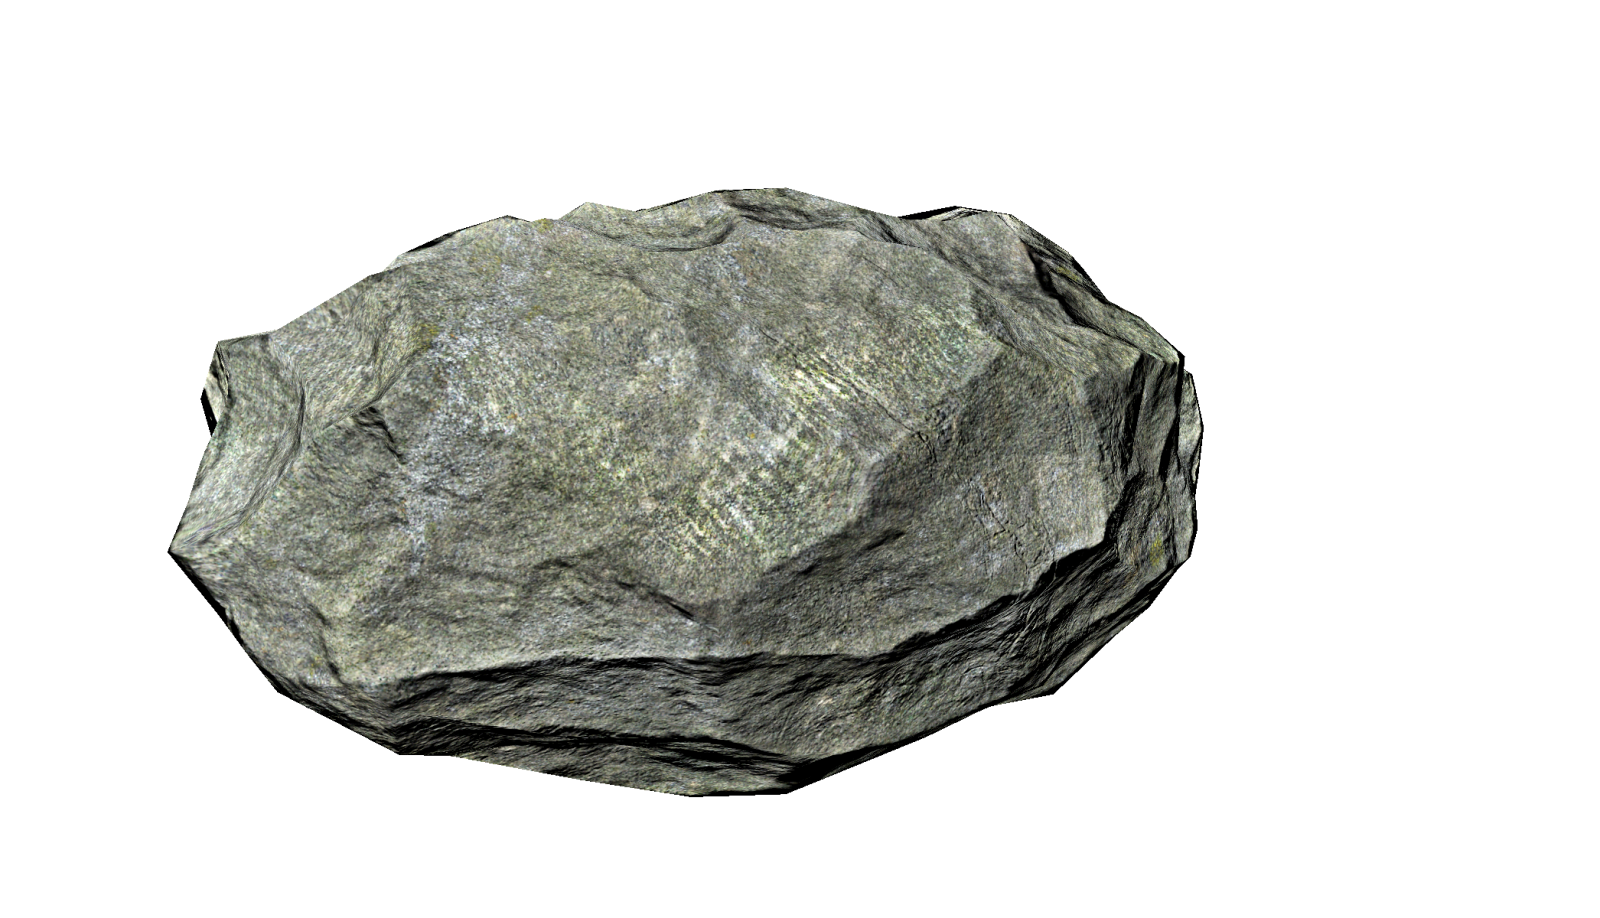 Rock PNG - 11846